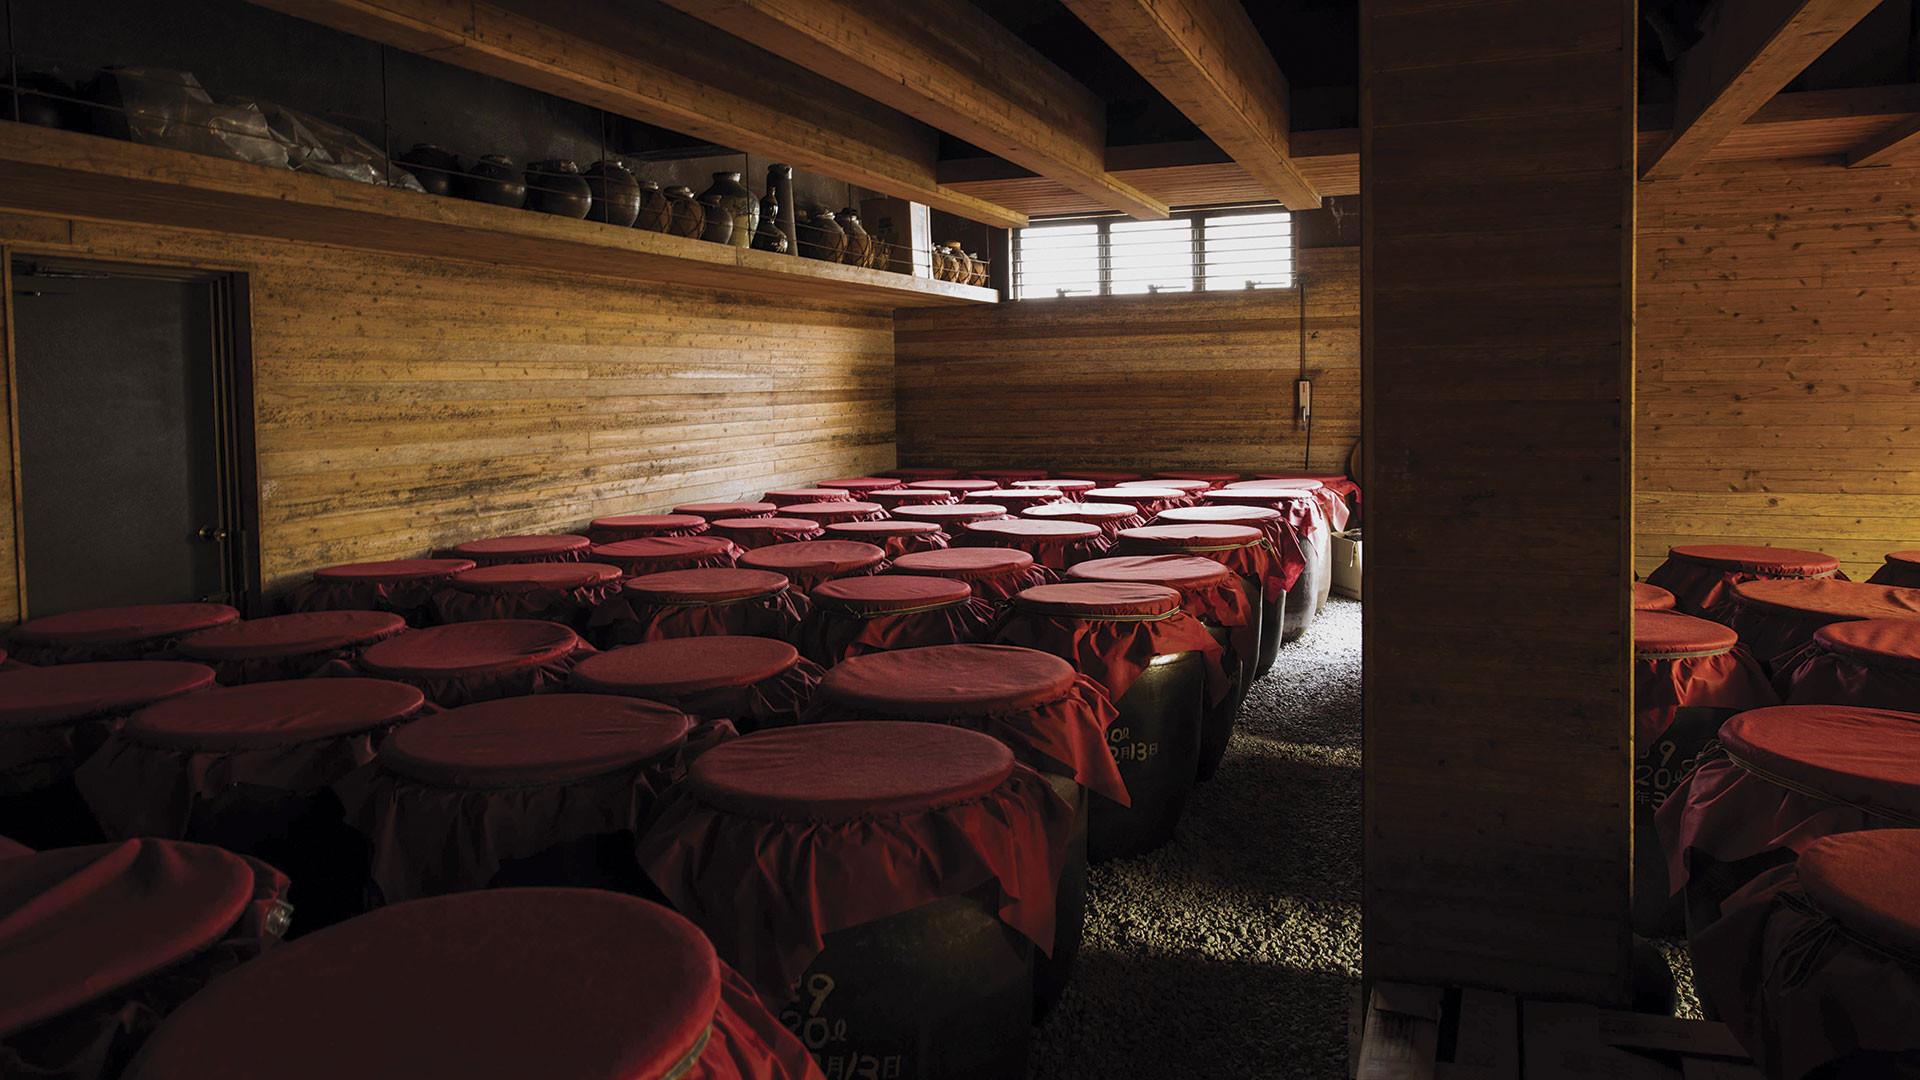 Awamori aging in ceramic urns at Zuisen